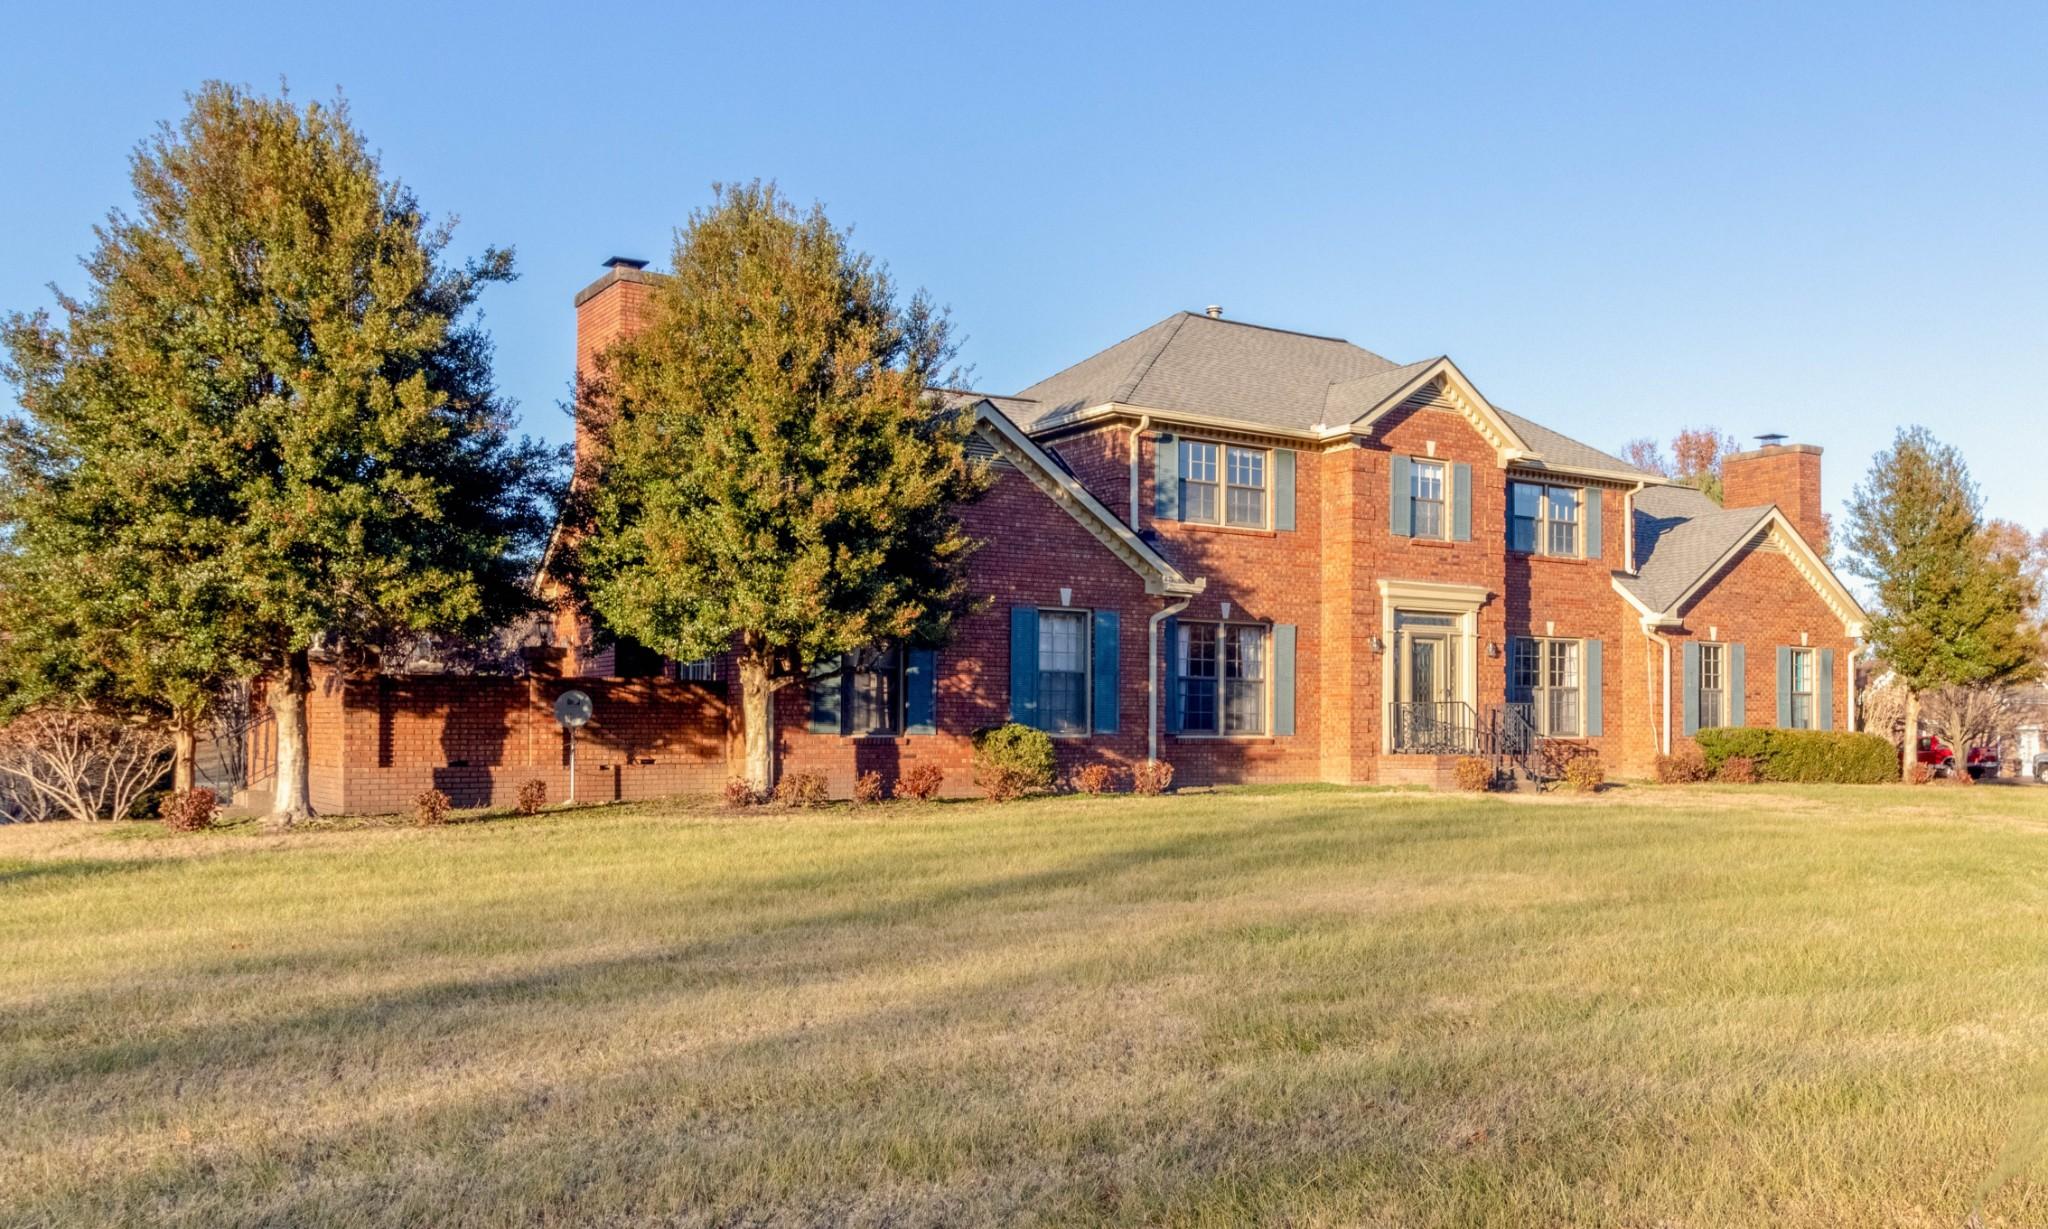 301 Abby Ln, Clarksville, TN 37043 - Clarksville, TN real estate listing